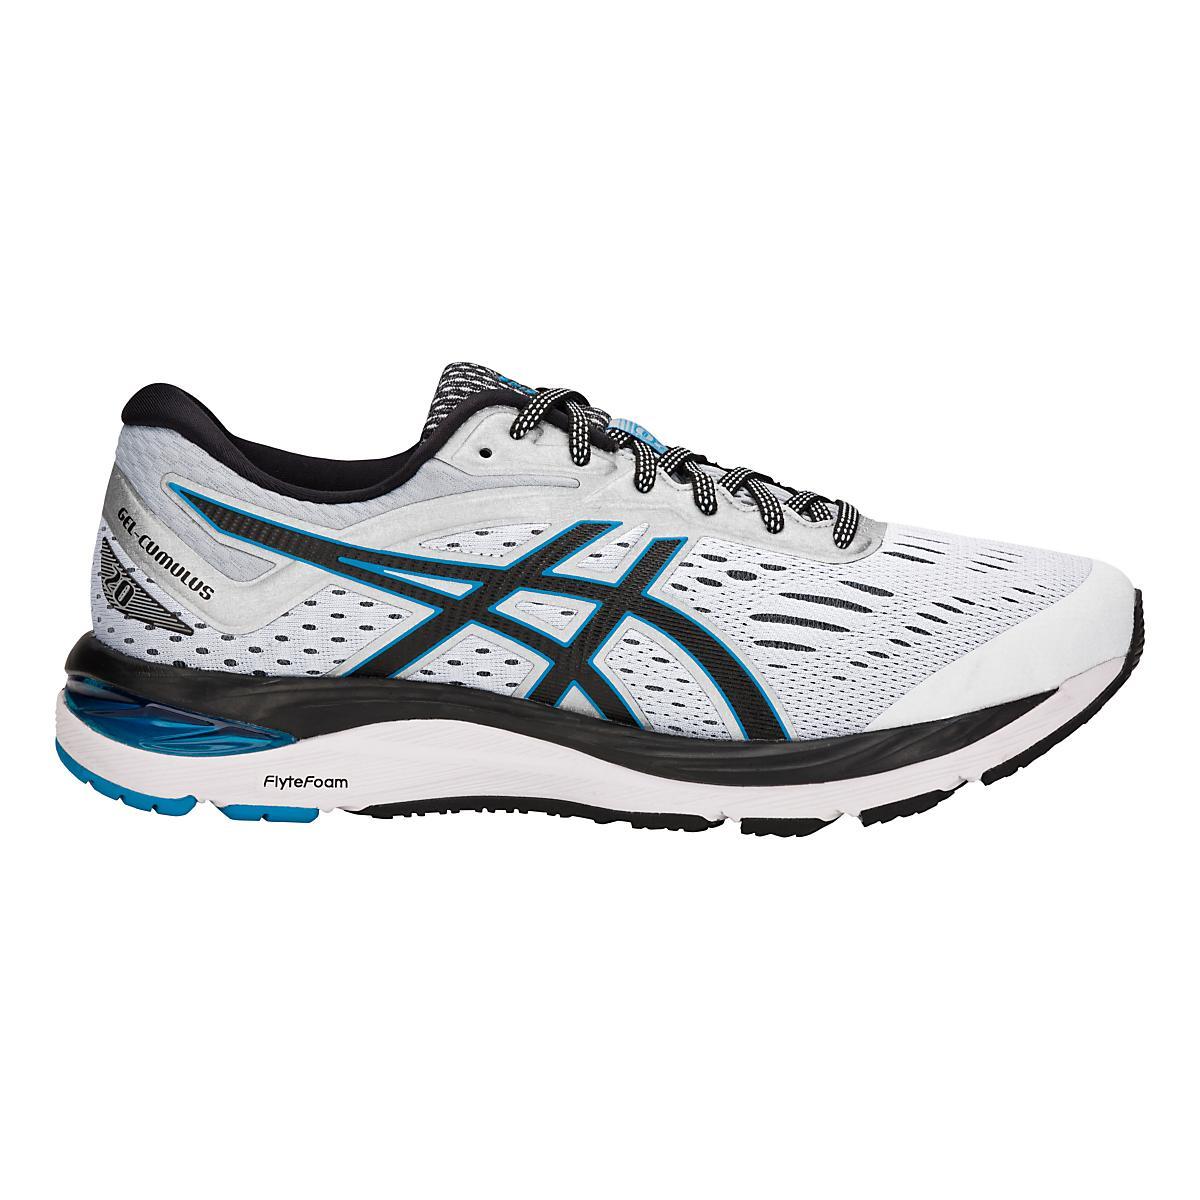 43591bb3b1 Mens ASICS GEL-Cumulus 20 Running Shoe at Road Runner Sports